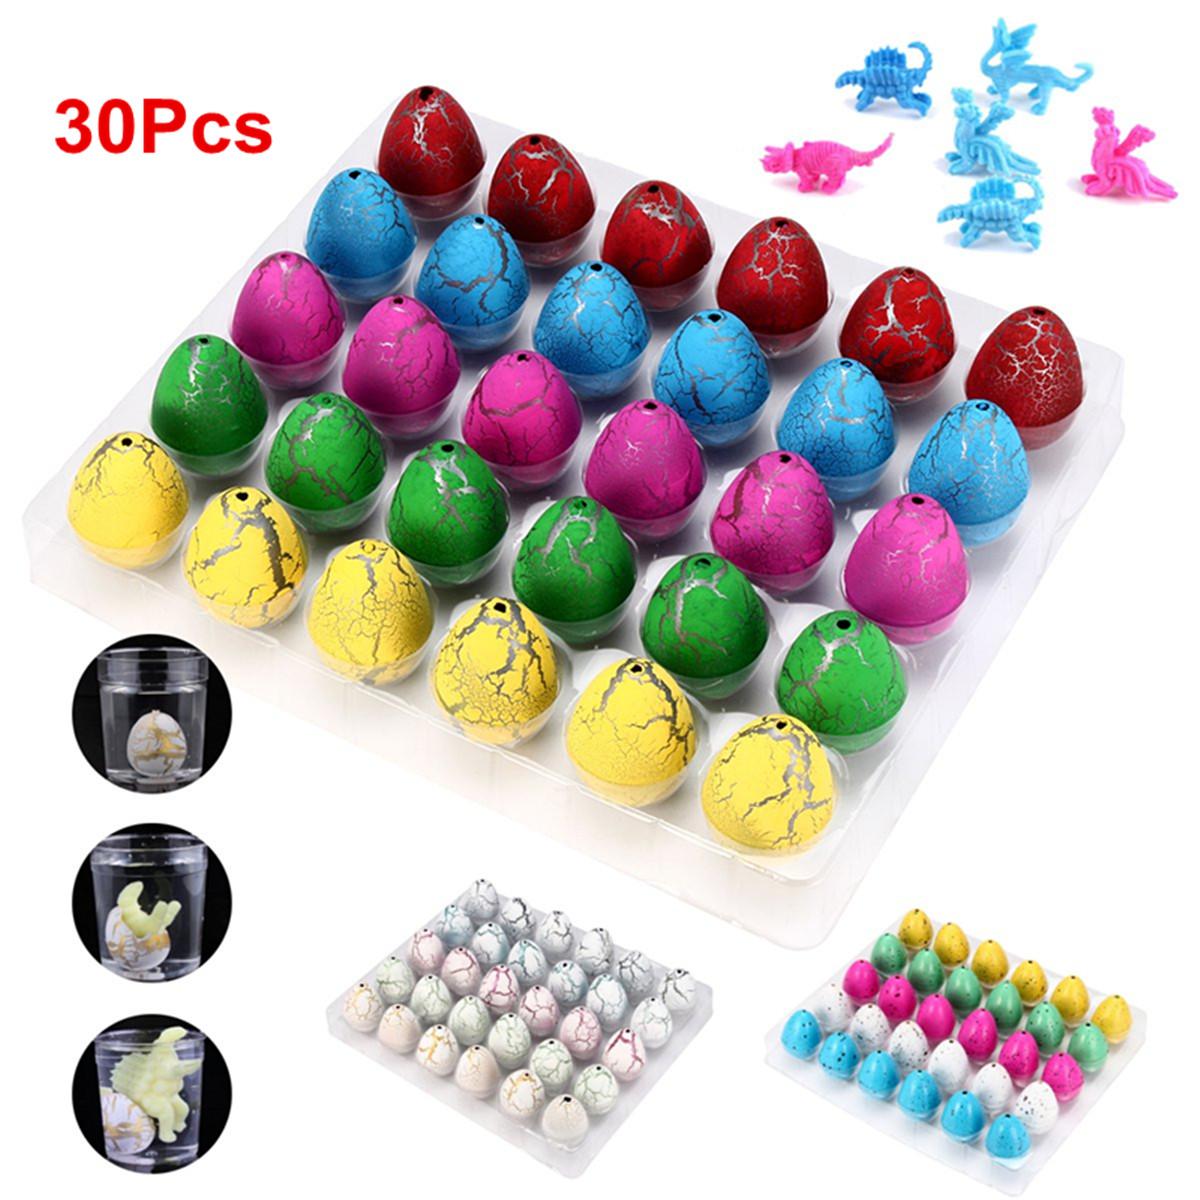 60pcs Magic Add Water Dinosaur Eggs Hatching Dino Growing Children Toy Gift YP